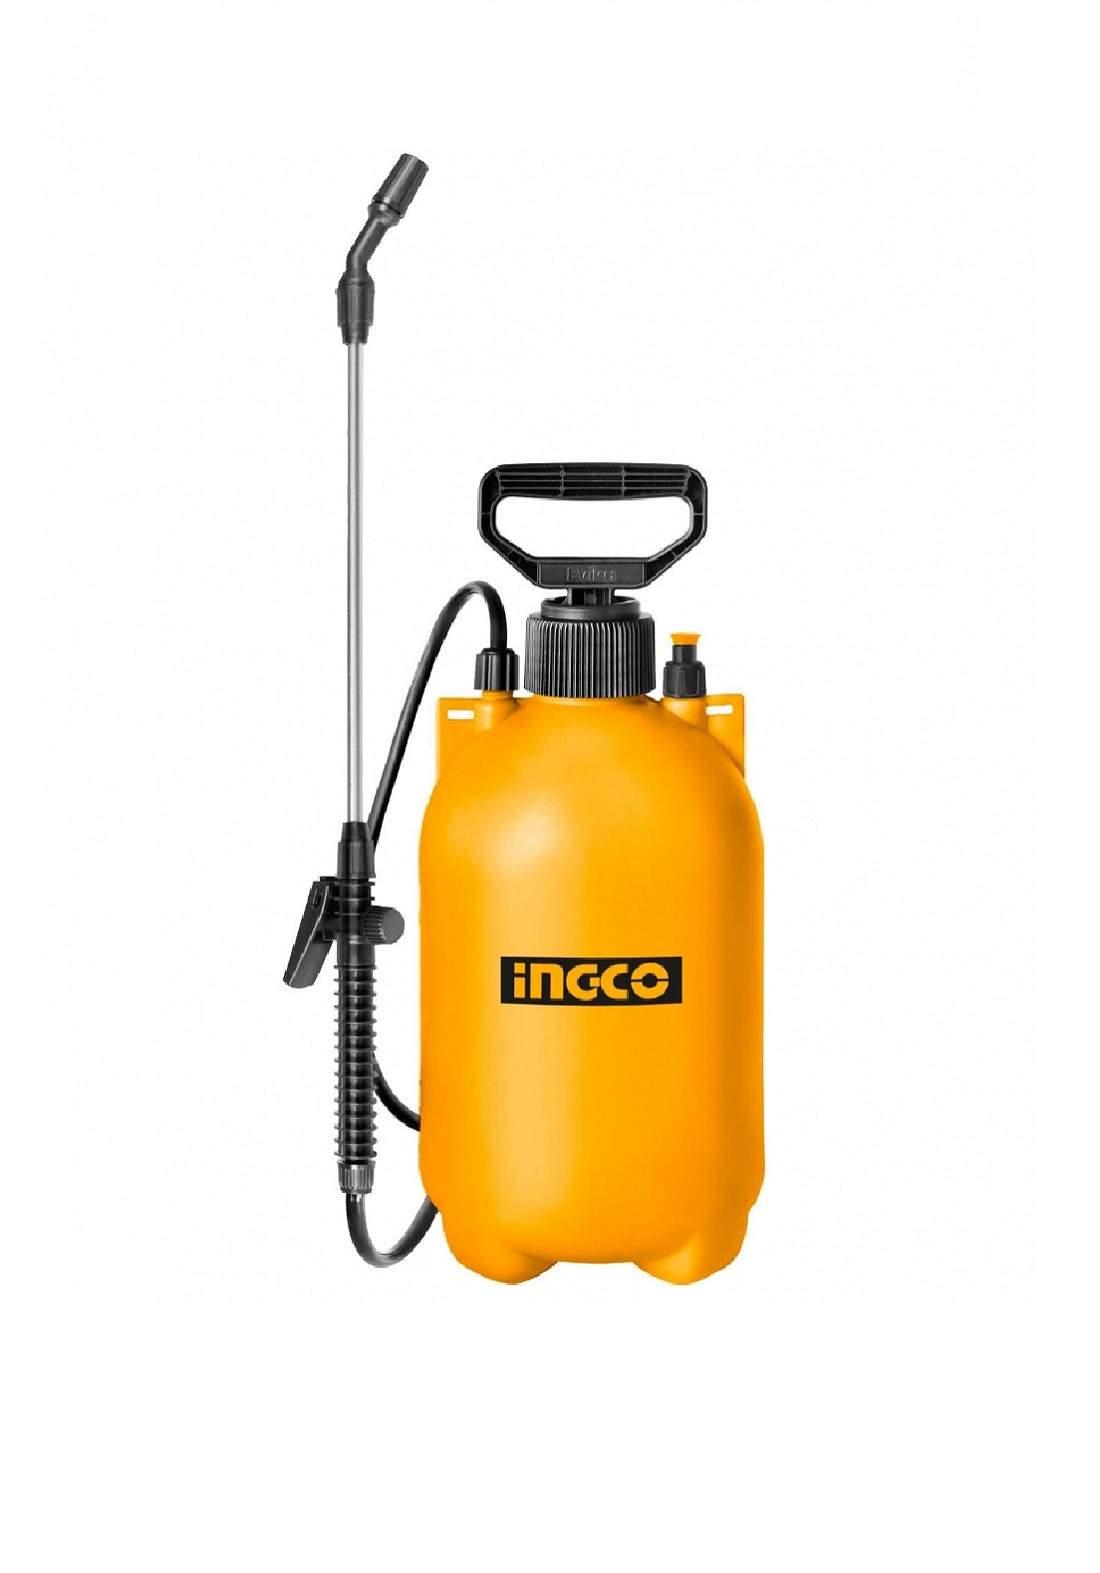 INGCO HSPP3051 5L Pressure Pump Sprayer IHT بخاخ مرش مبيدات حشرية